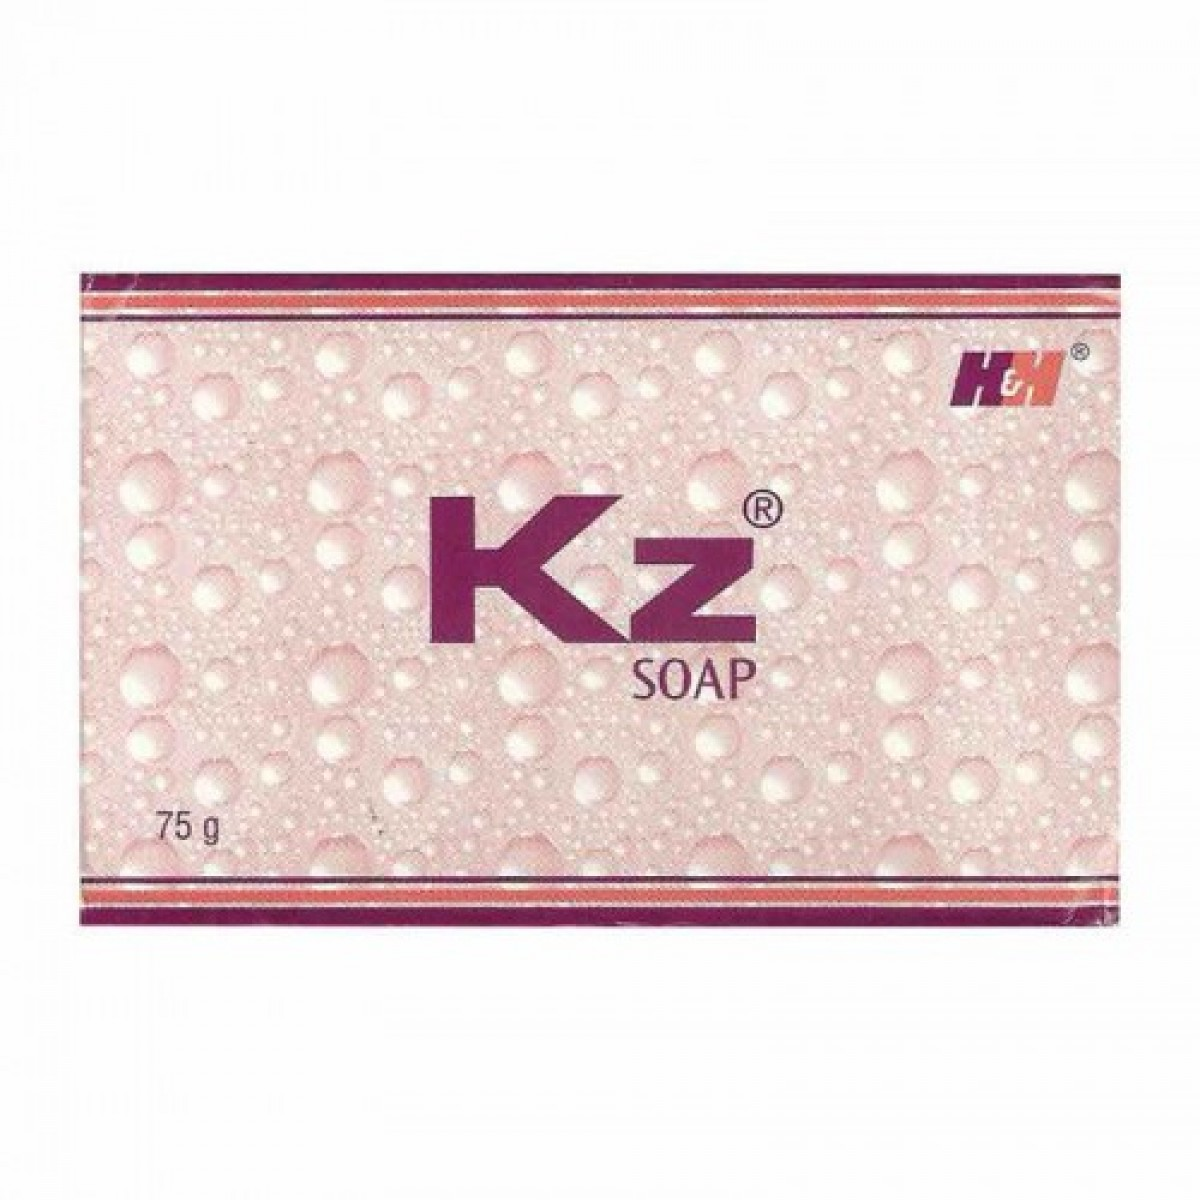 kz soap 75G pack of 3